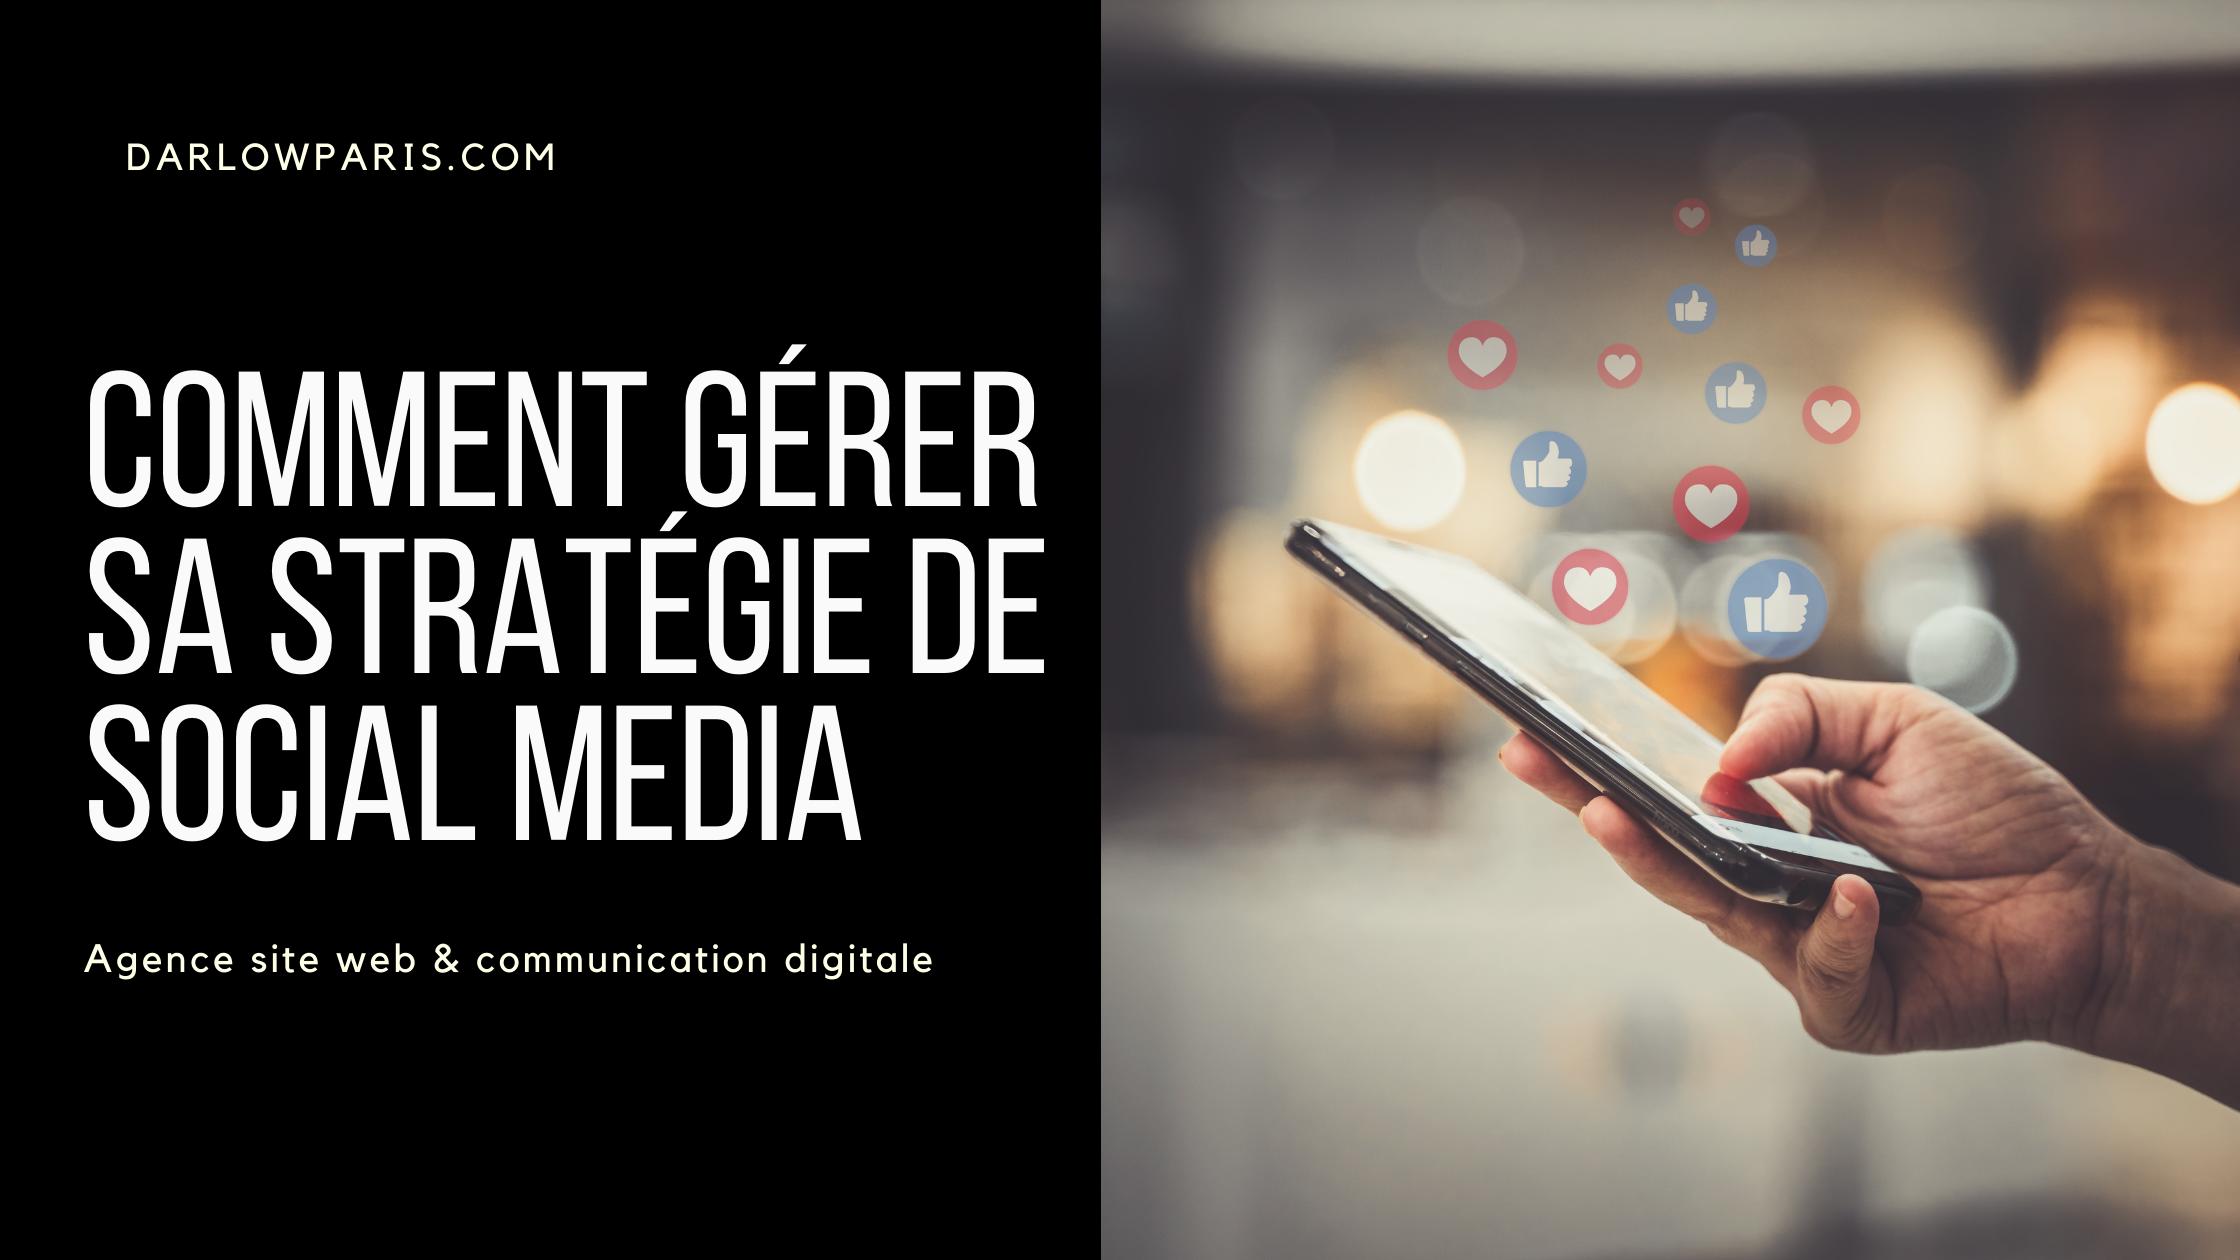 Comment gérer sa stratégie social media